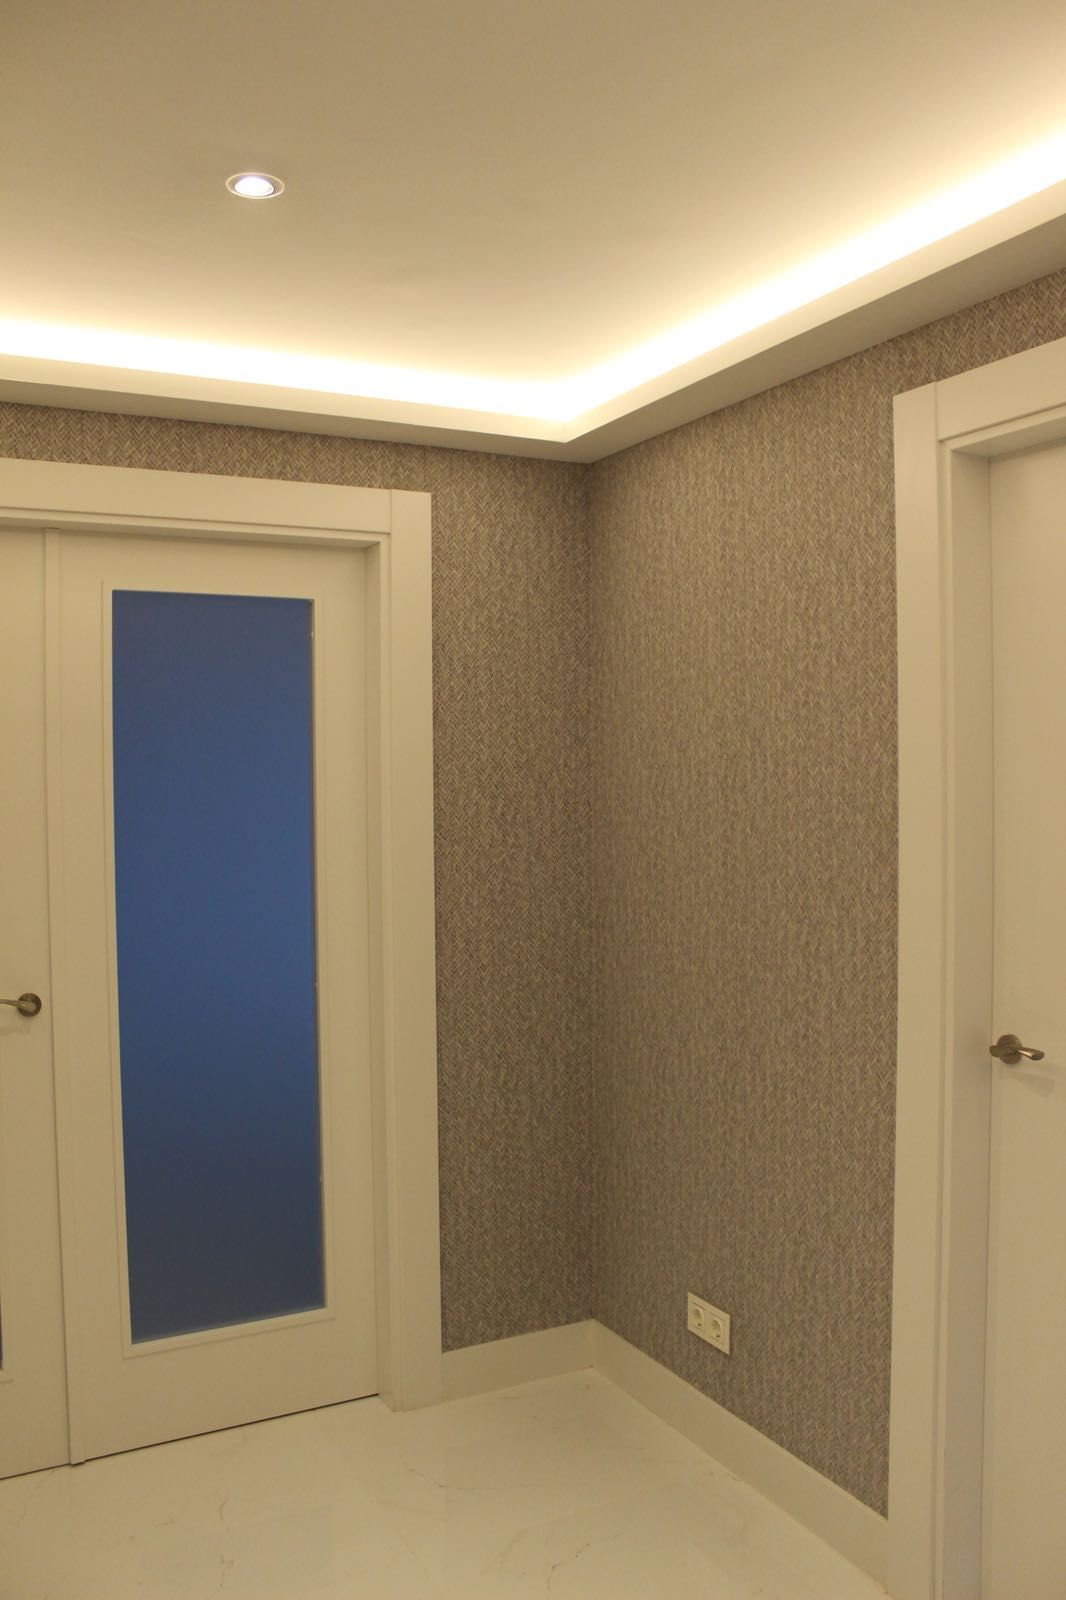 Fabricación e instalación de puertas de interior